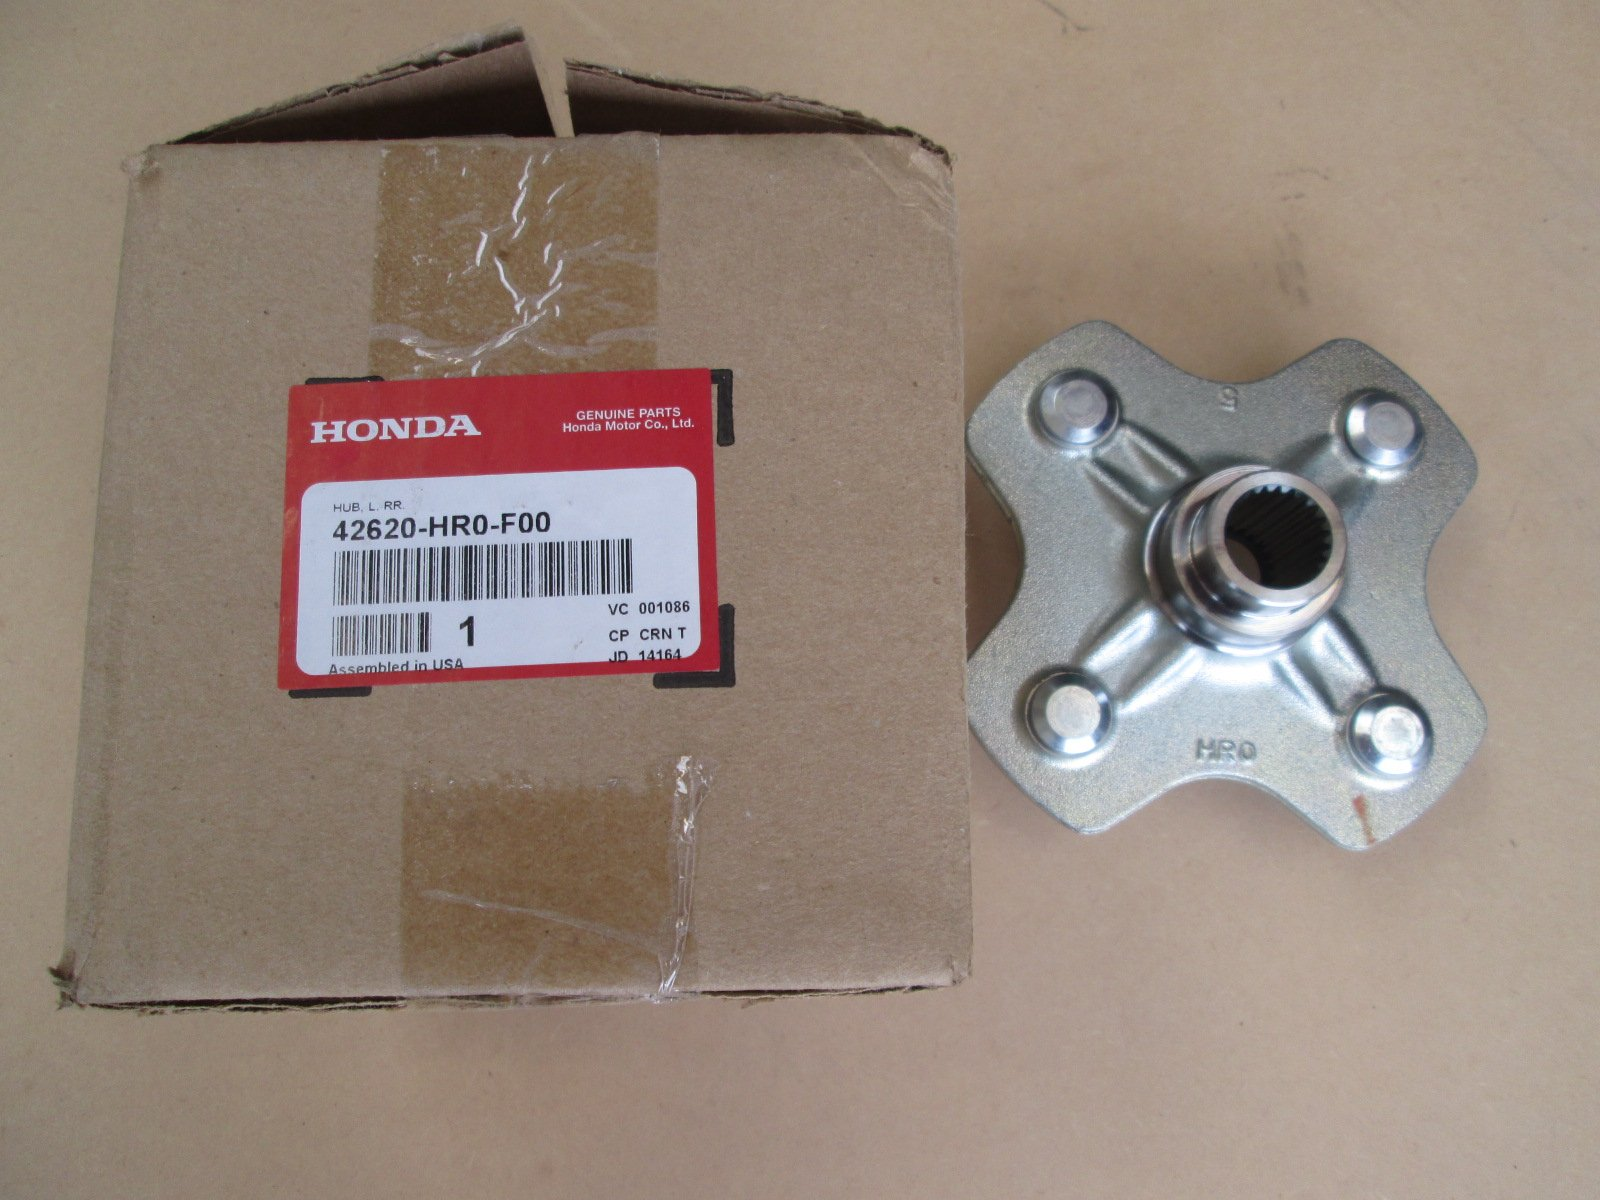 Genuine Honda 2012/13L/H Rear Axle Hub42620-HR0-F00